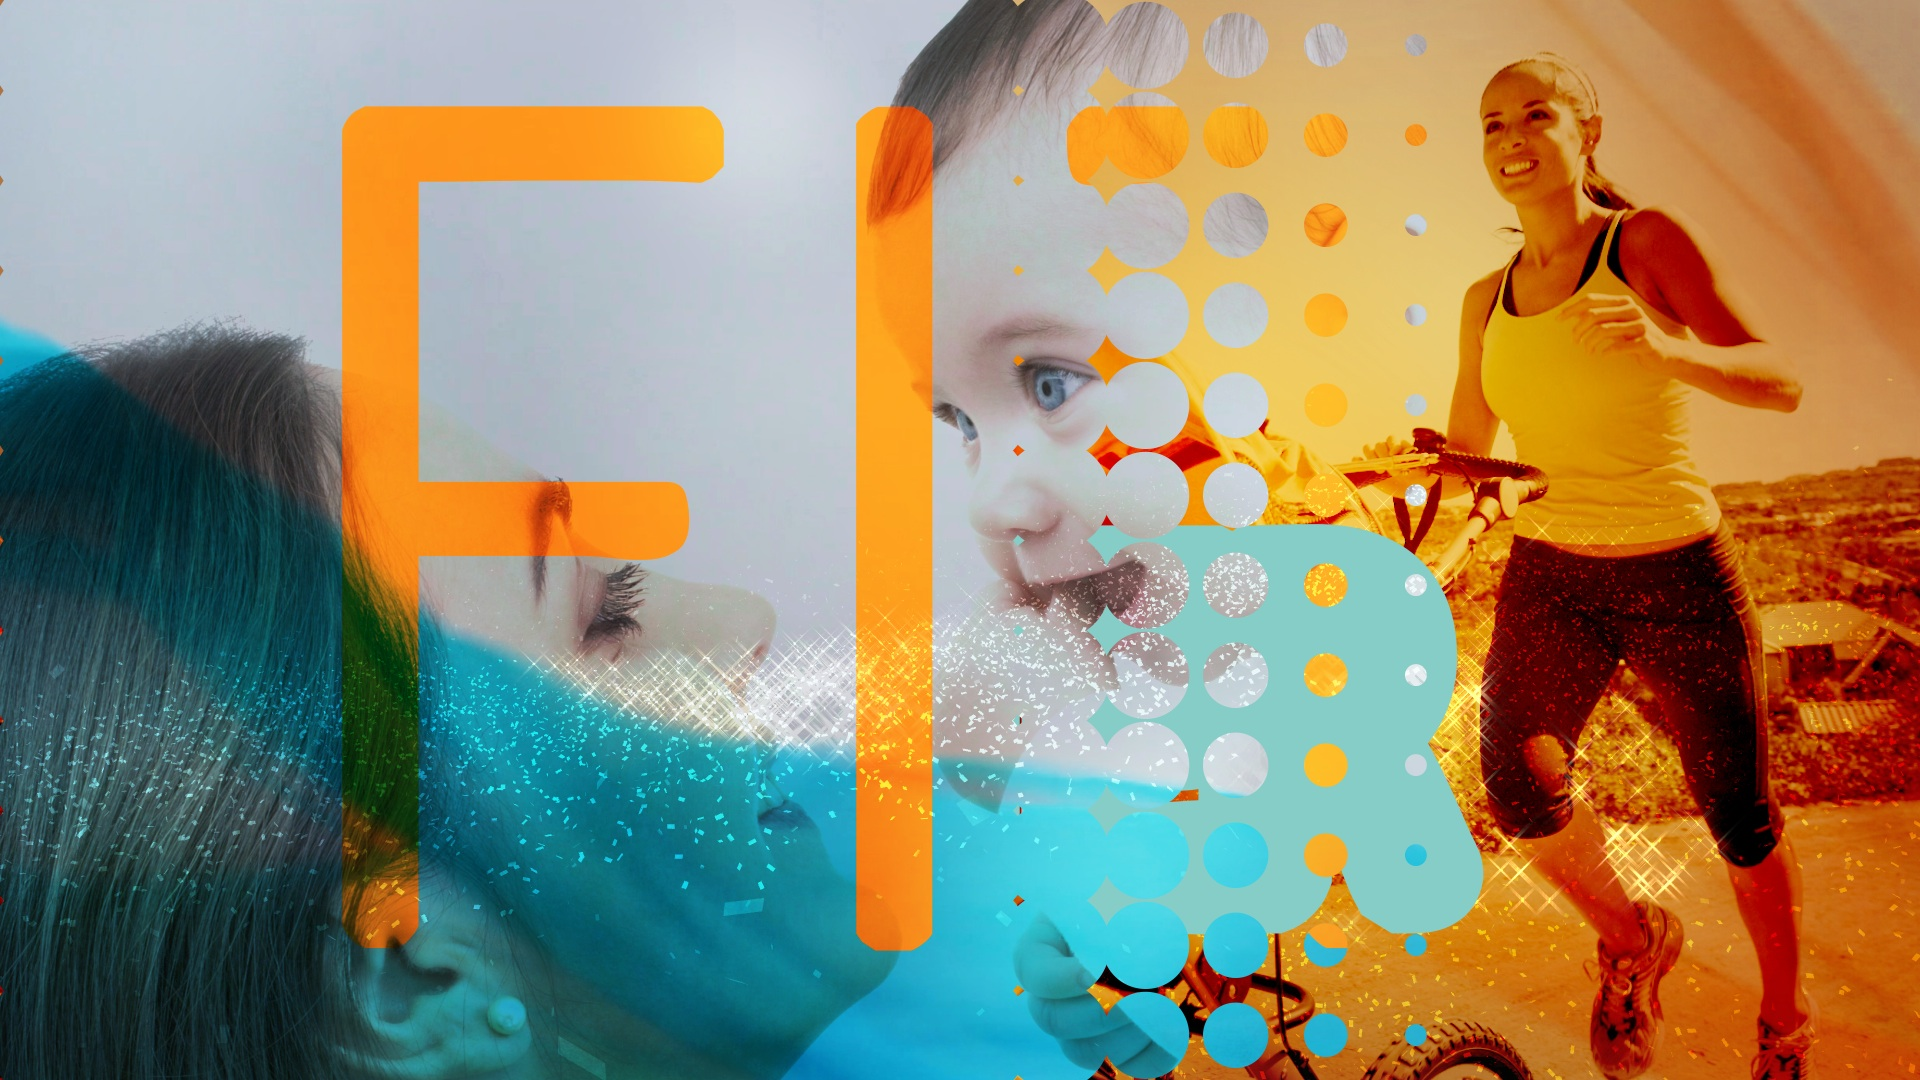 motion graphic design for online tv network Lifescript-tv | jonberrydesign